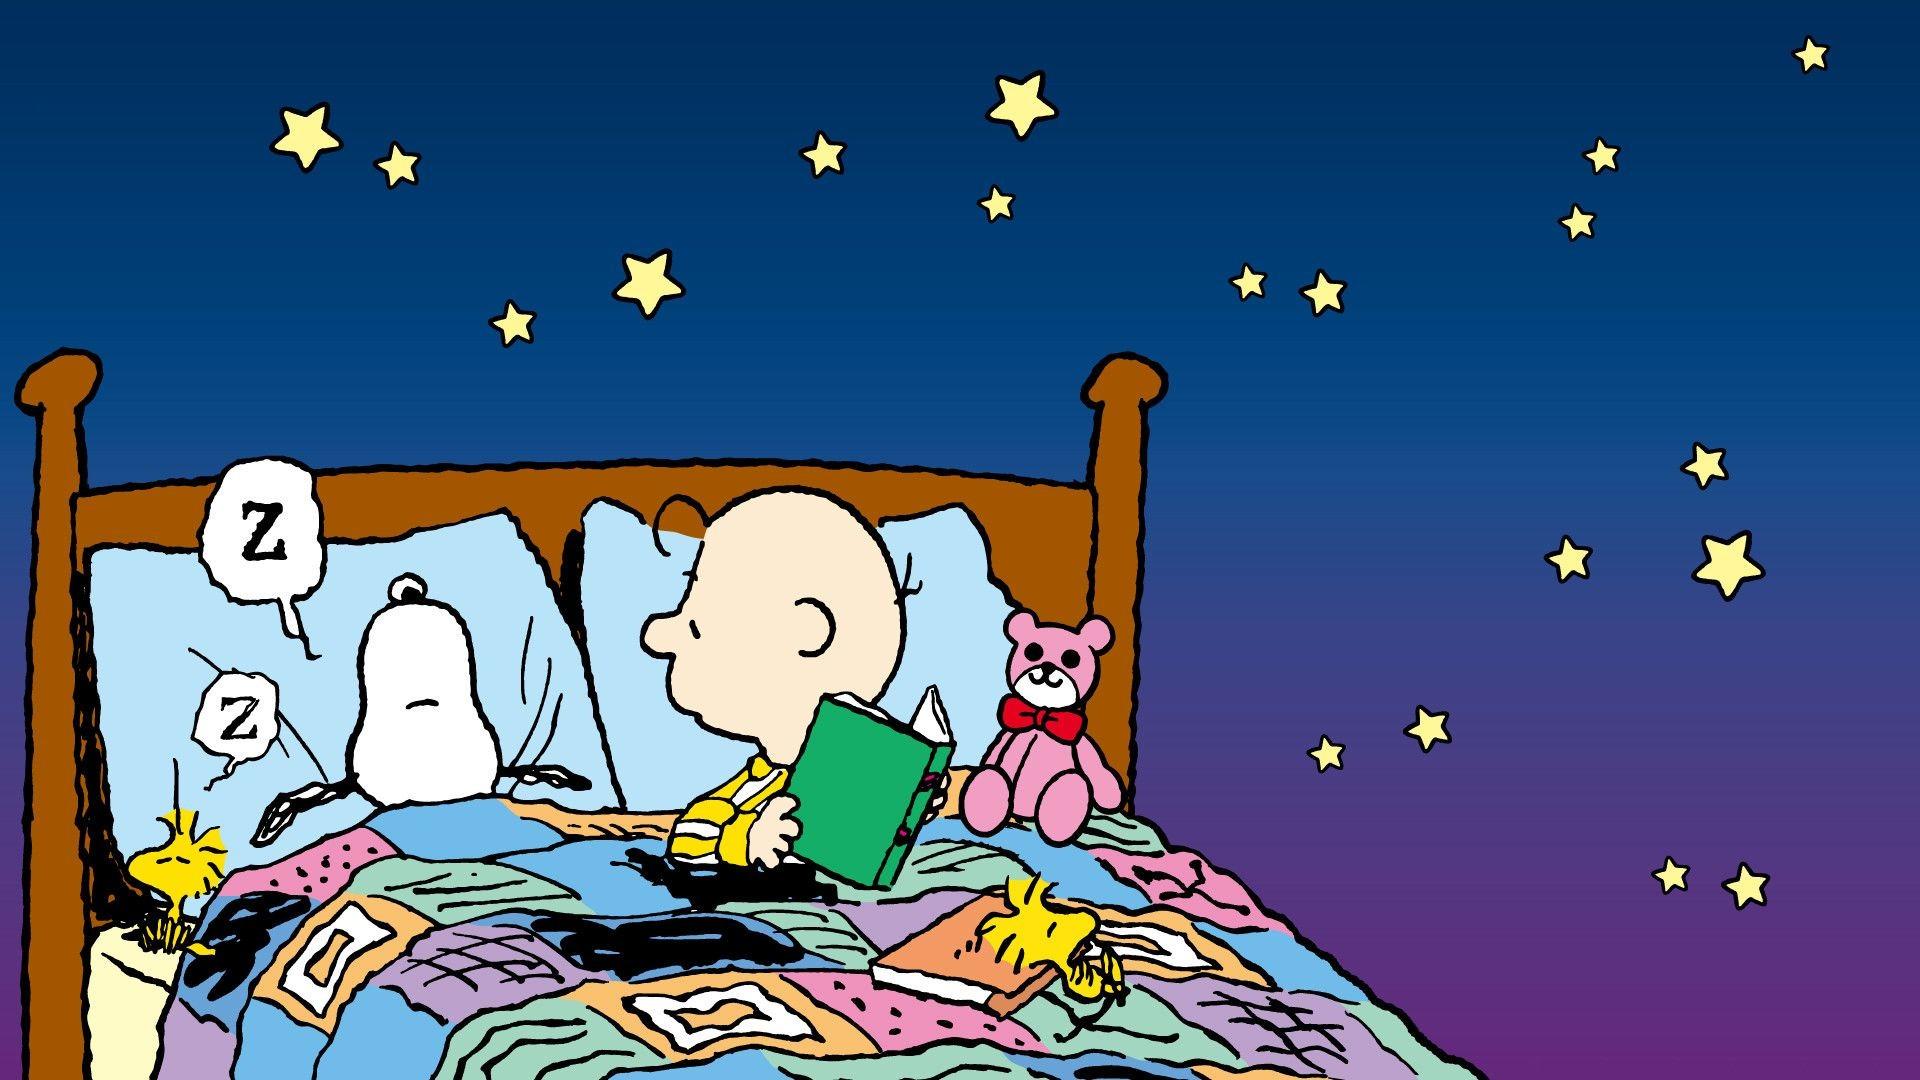 Snoopy Sleeping Wallpaper